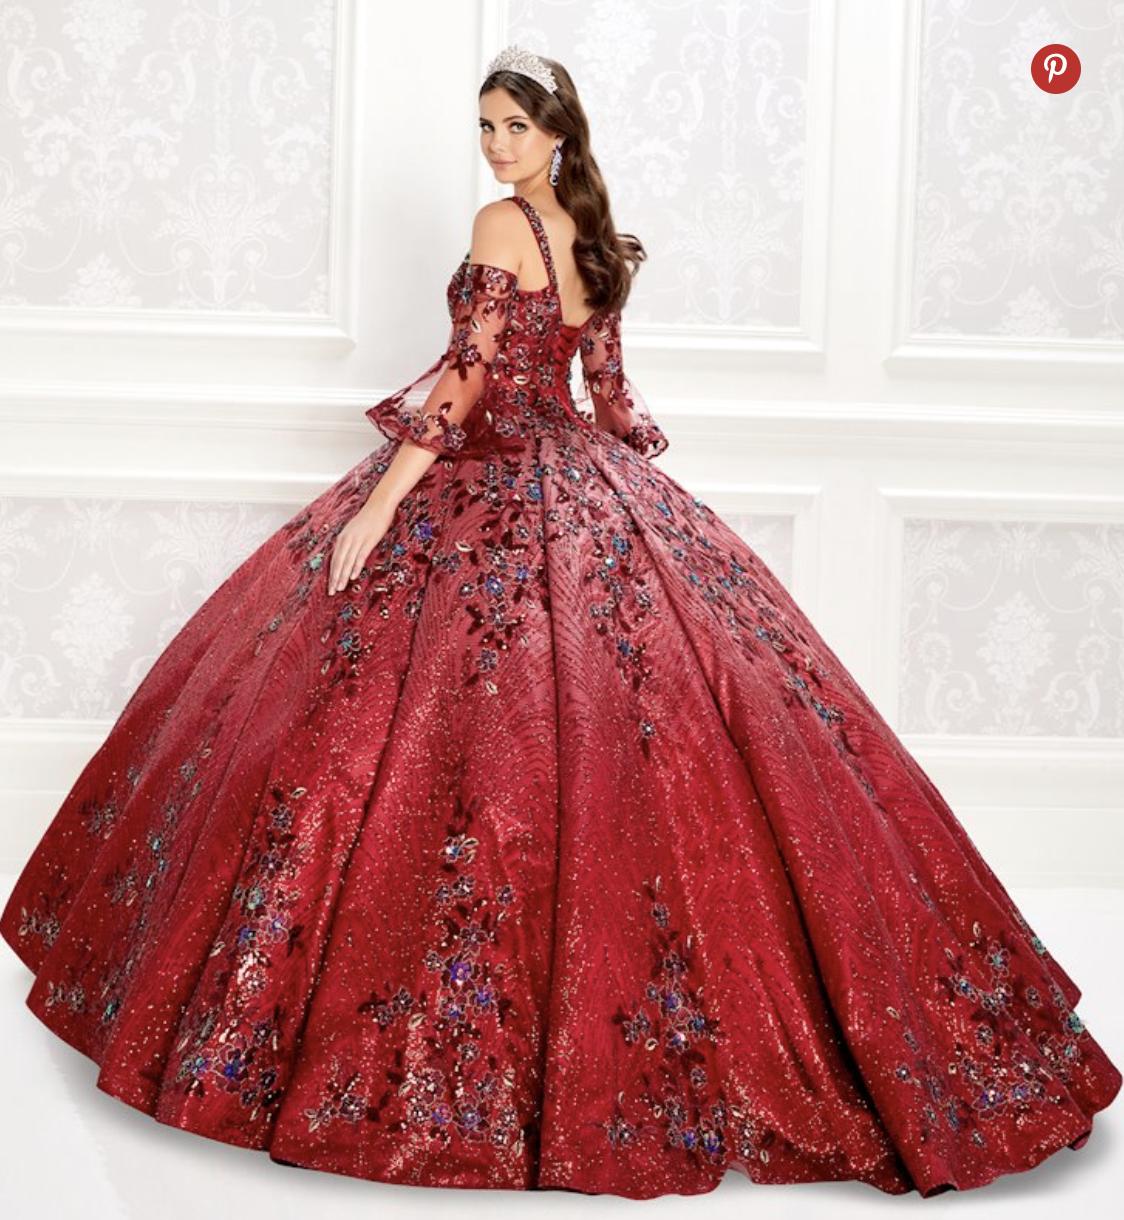 Princesa By Ariana Vara PR22023